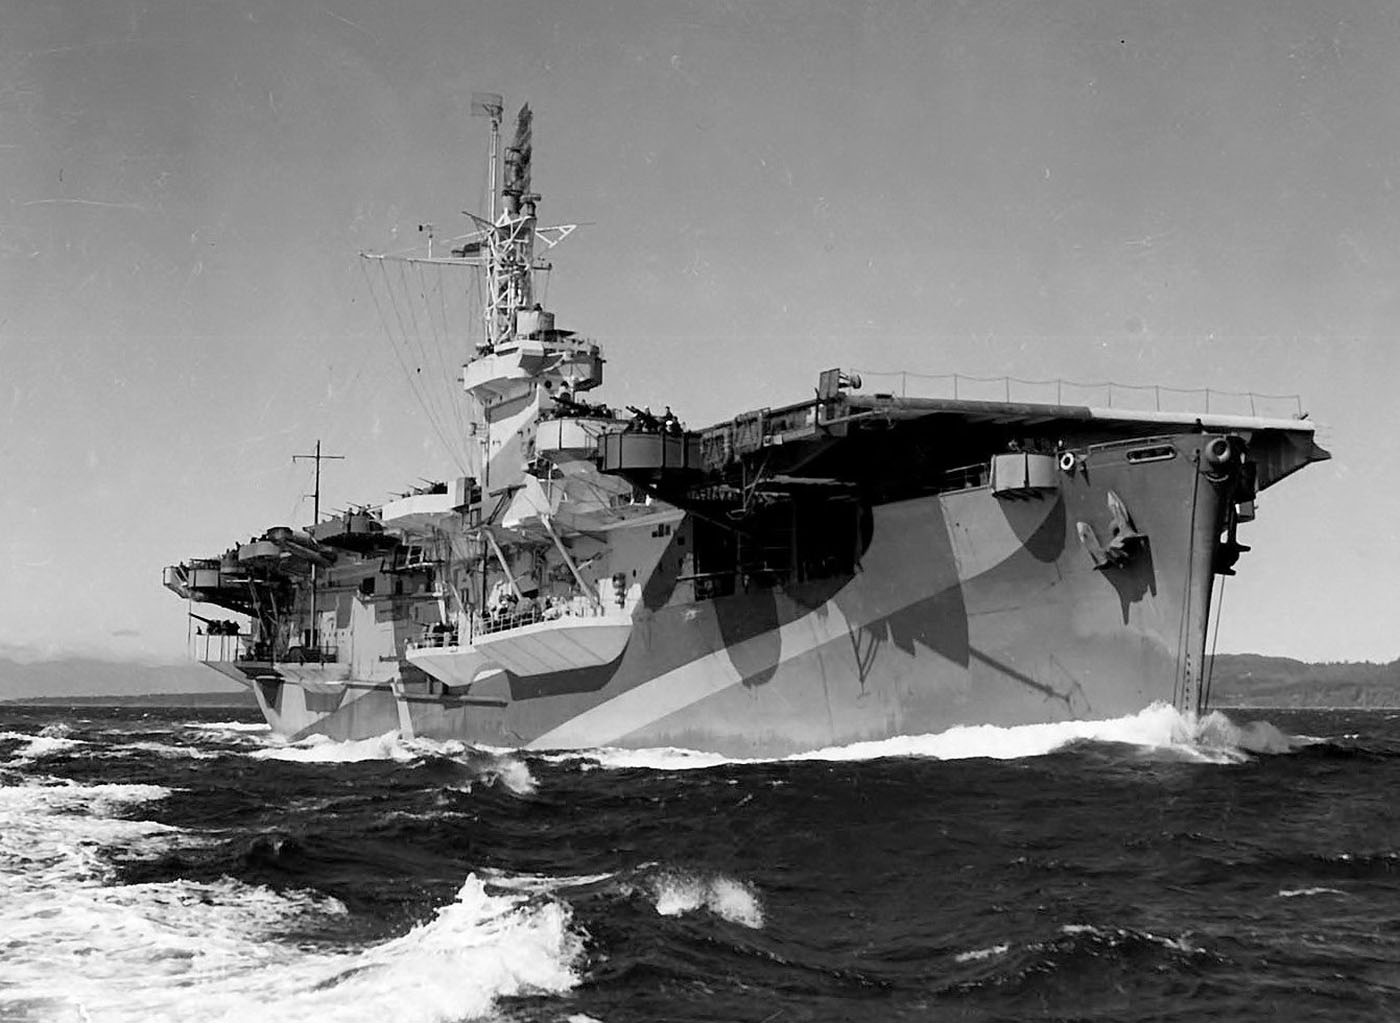 HMCS NABOB